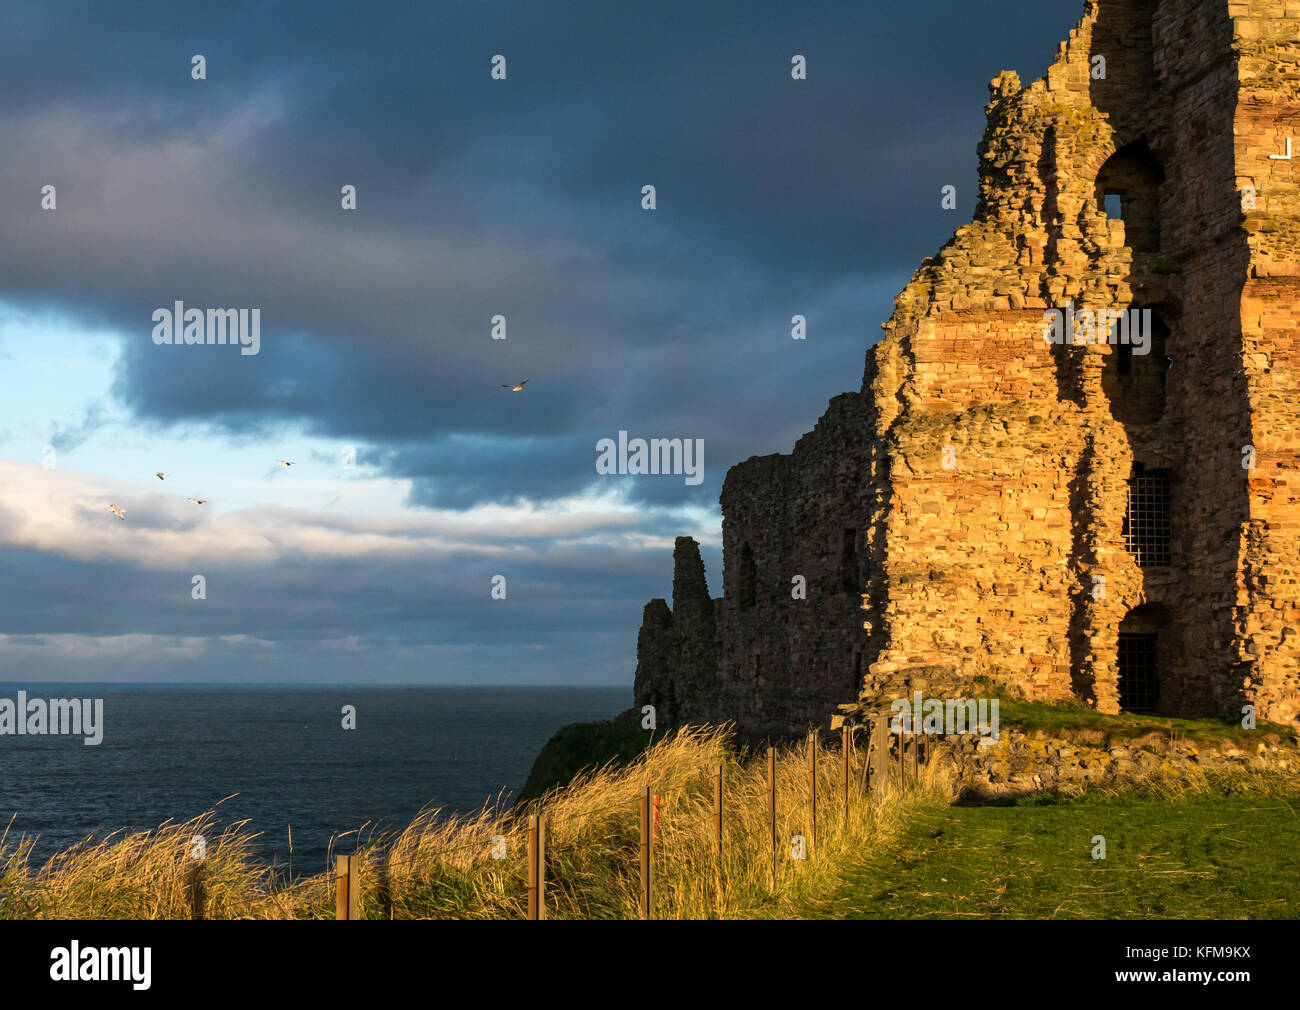 East Lothian, Scotland, UK. Warm low dusk sunlight on curtain wall of 14th century ruined Tantallon Castle, cliff - Stock Image